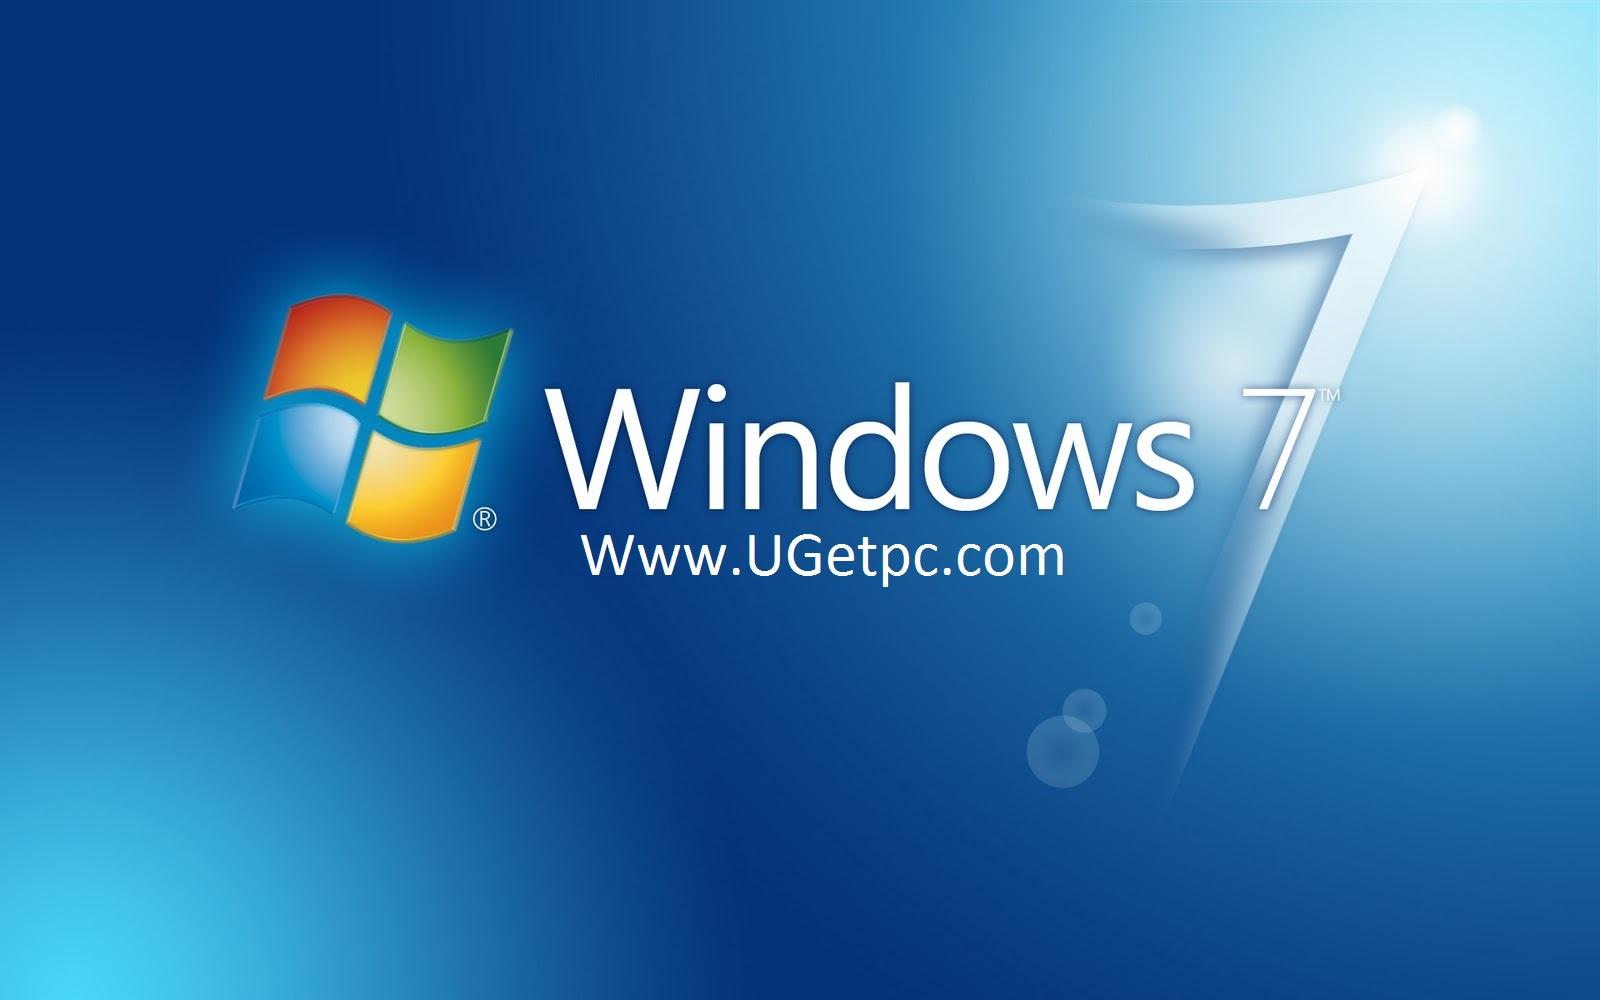 crack windows 7 ultimate 32 bit service pack 1